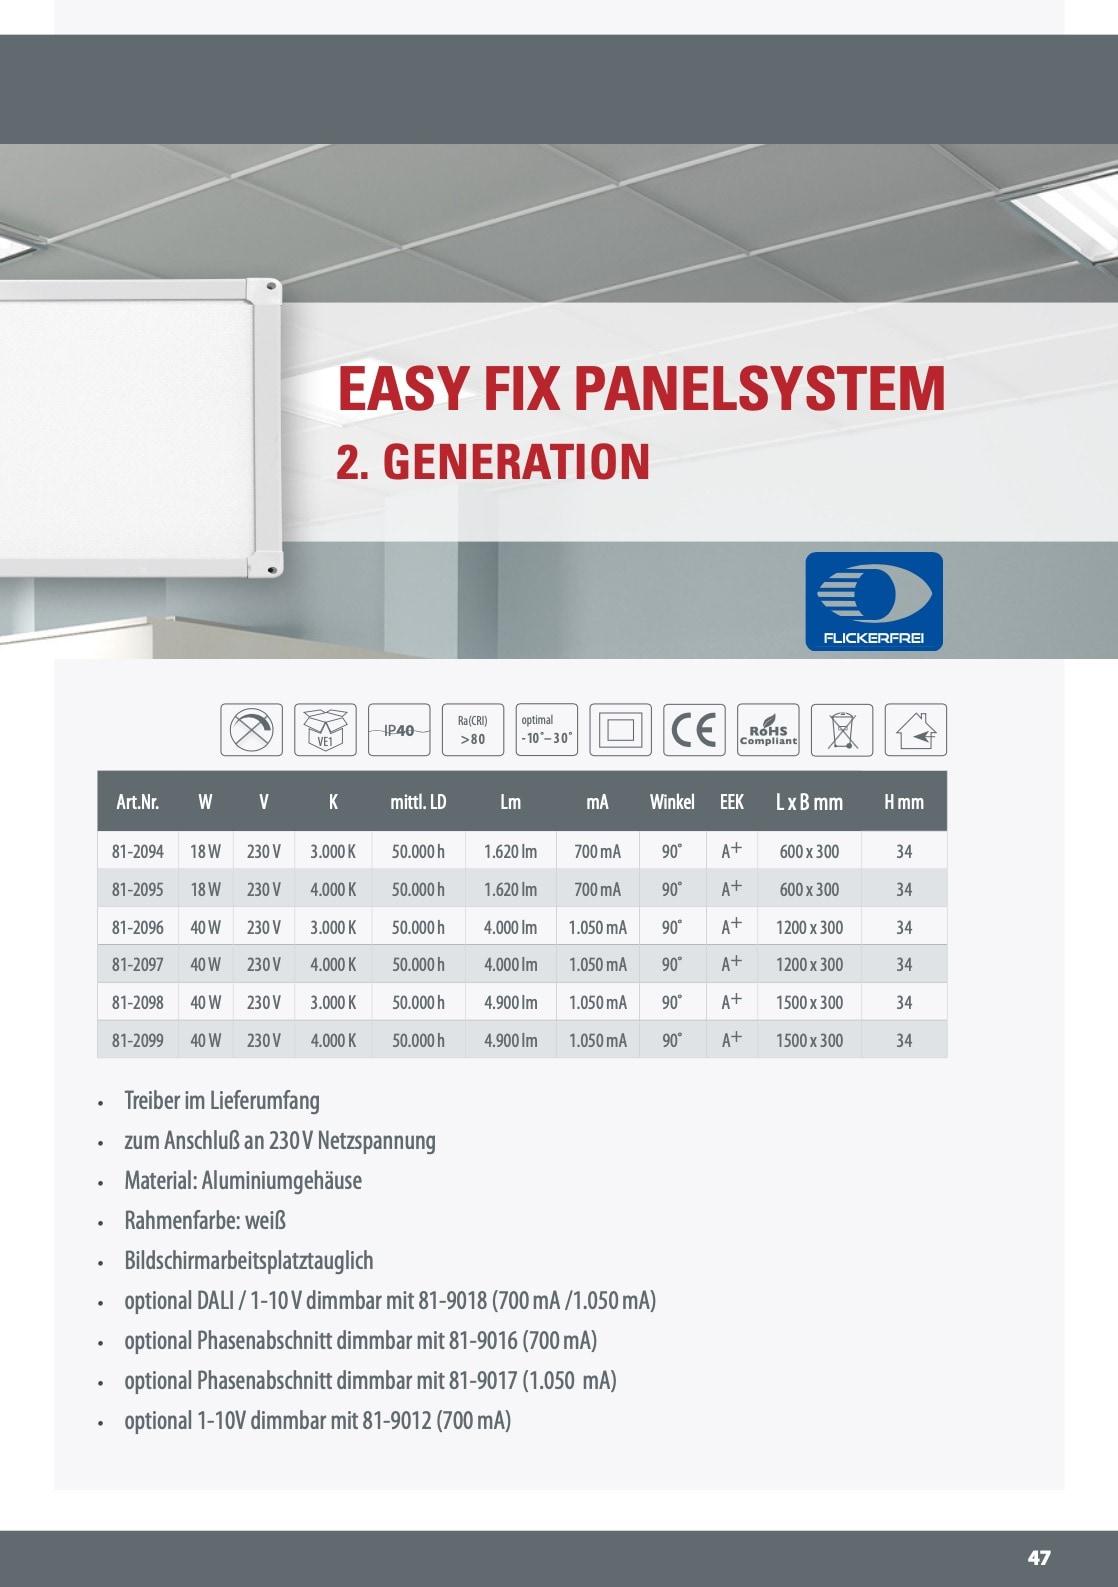 M-Light LED Deckananbau Panel UGR>19 1200x300x34mm 40W 4000K 4000lm weiß 81-2097